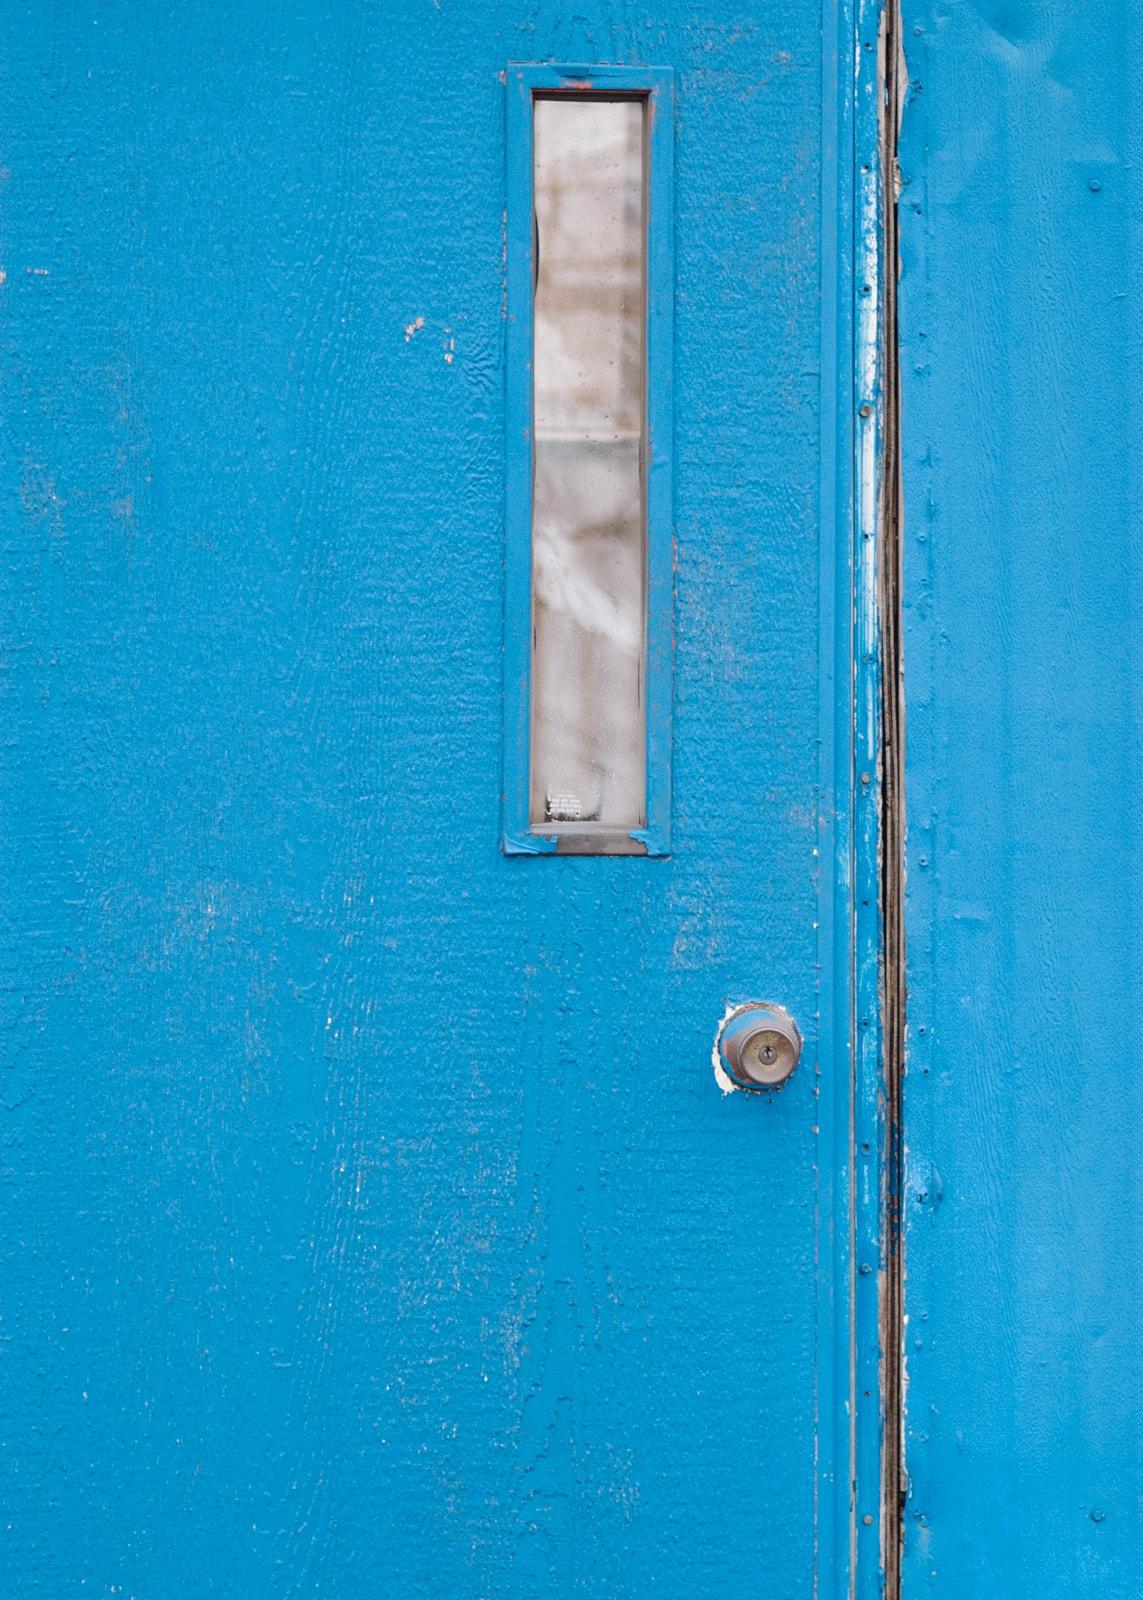 A blue mobile home door in Terrell, Texas